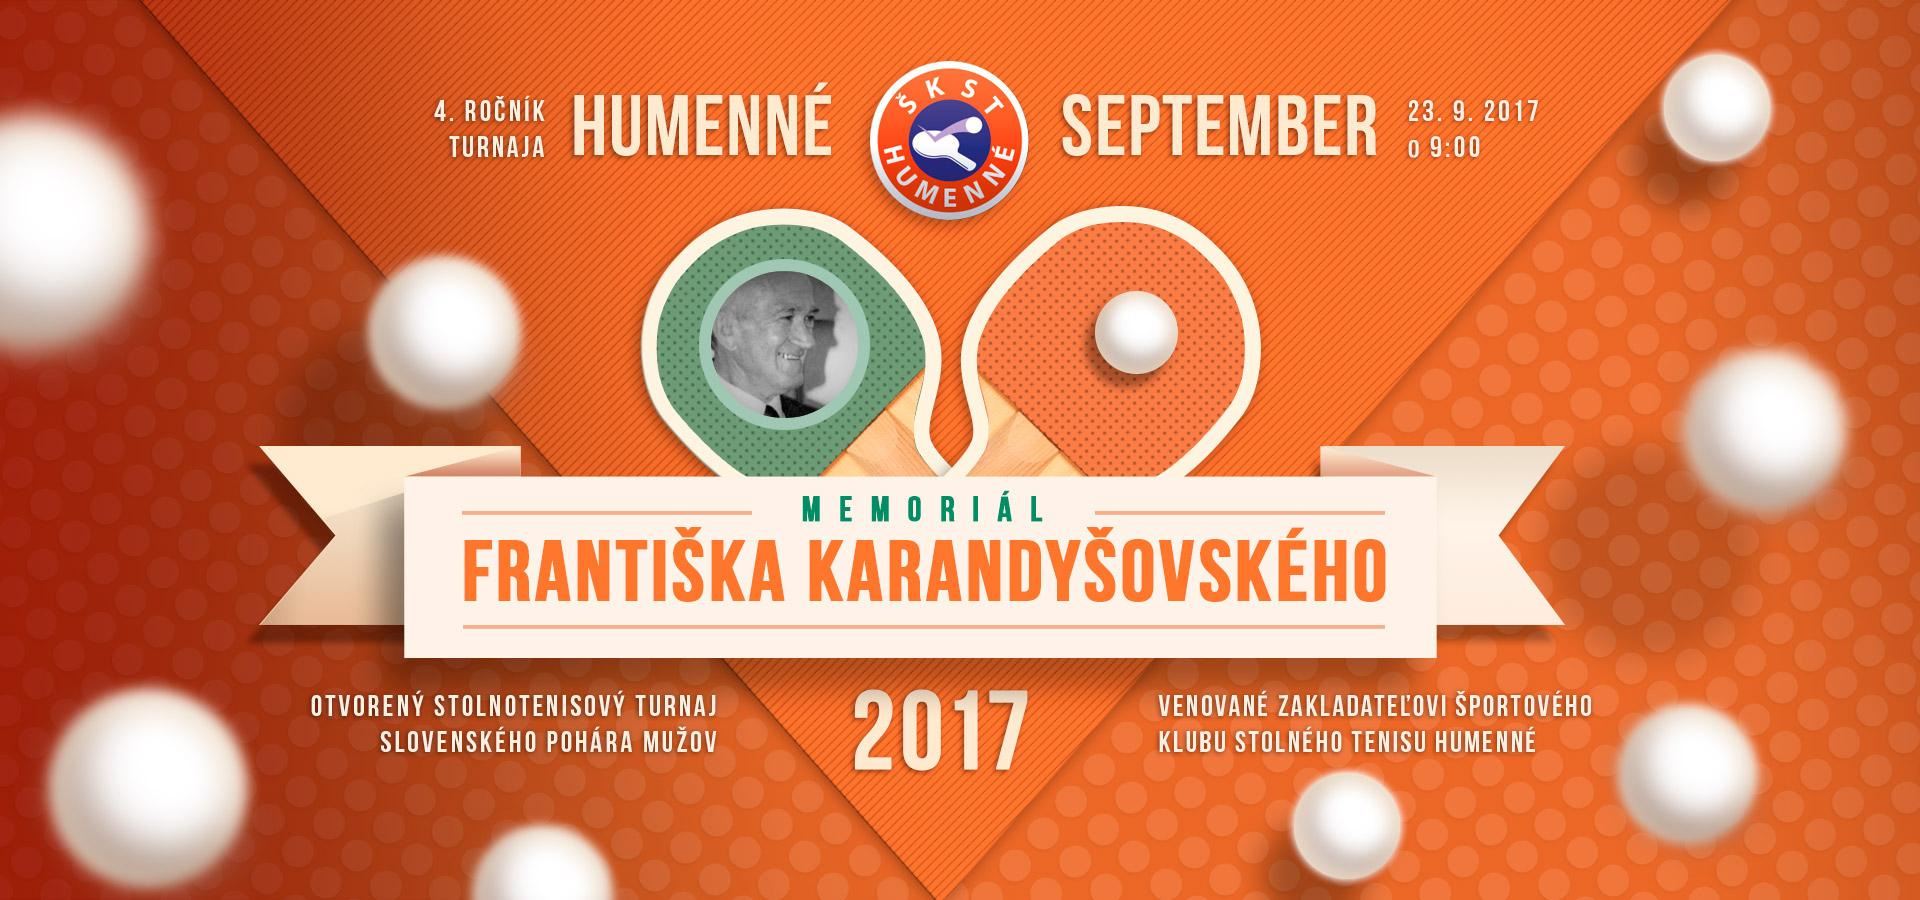 Memoriál Františka Karandyšovského 2017 v Humennom